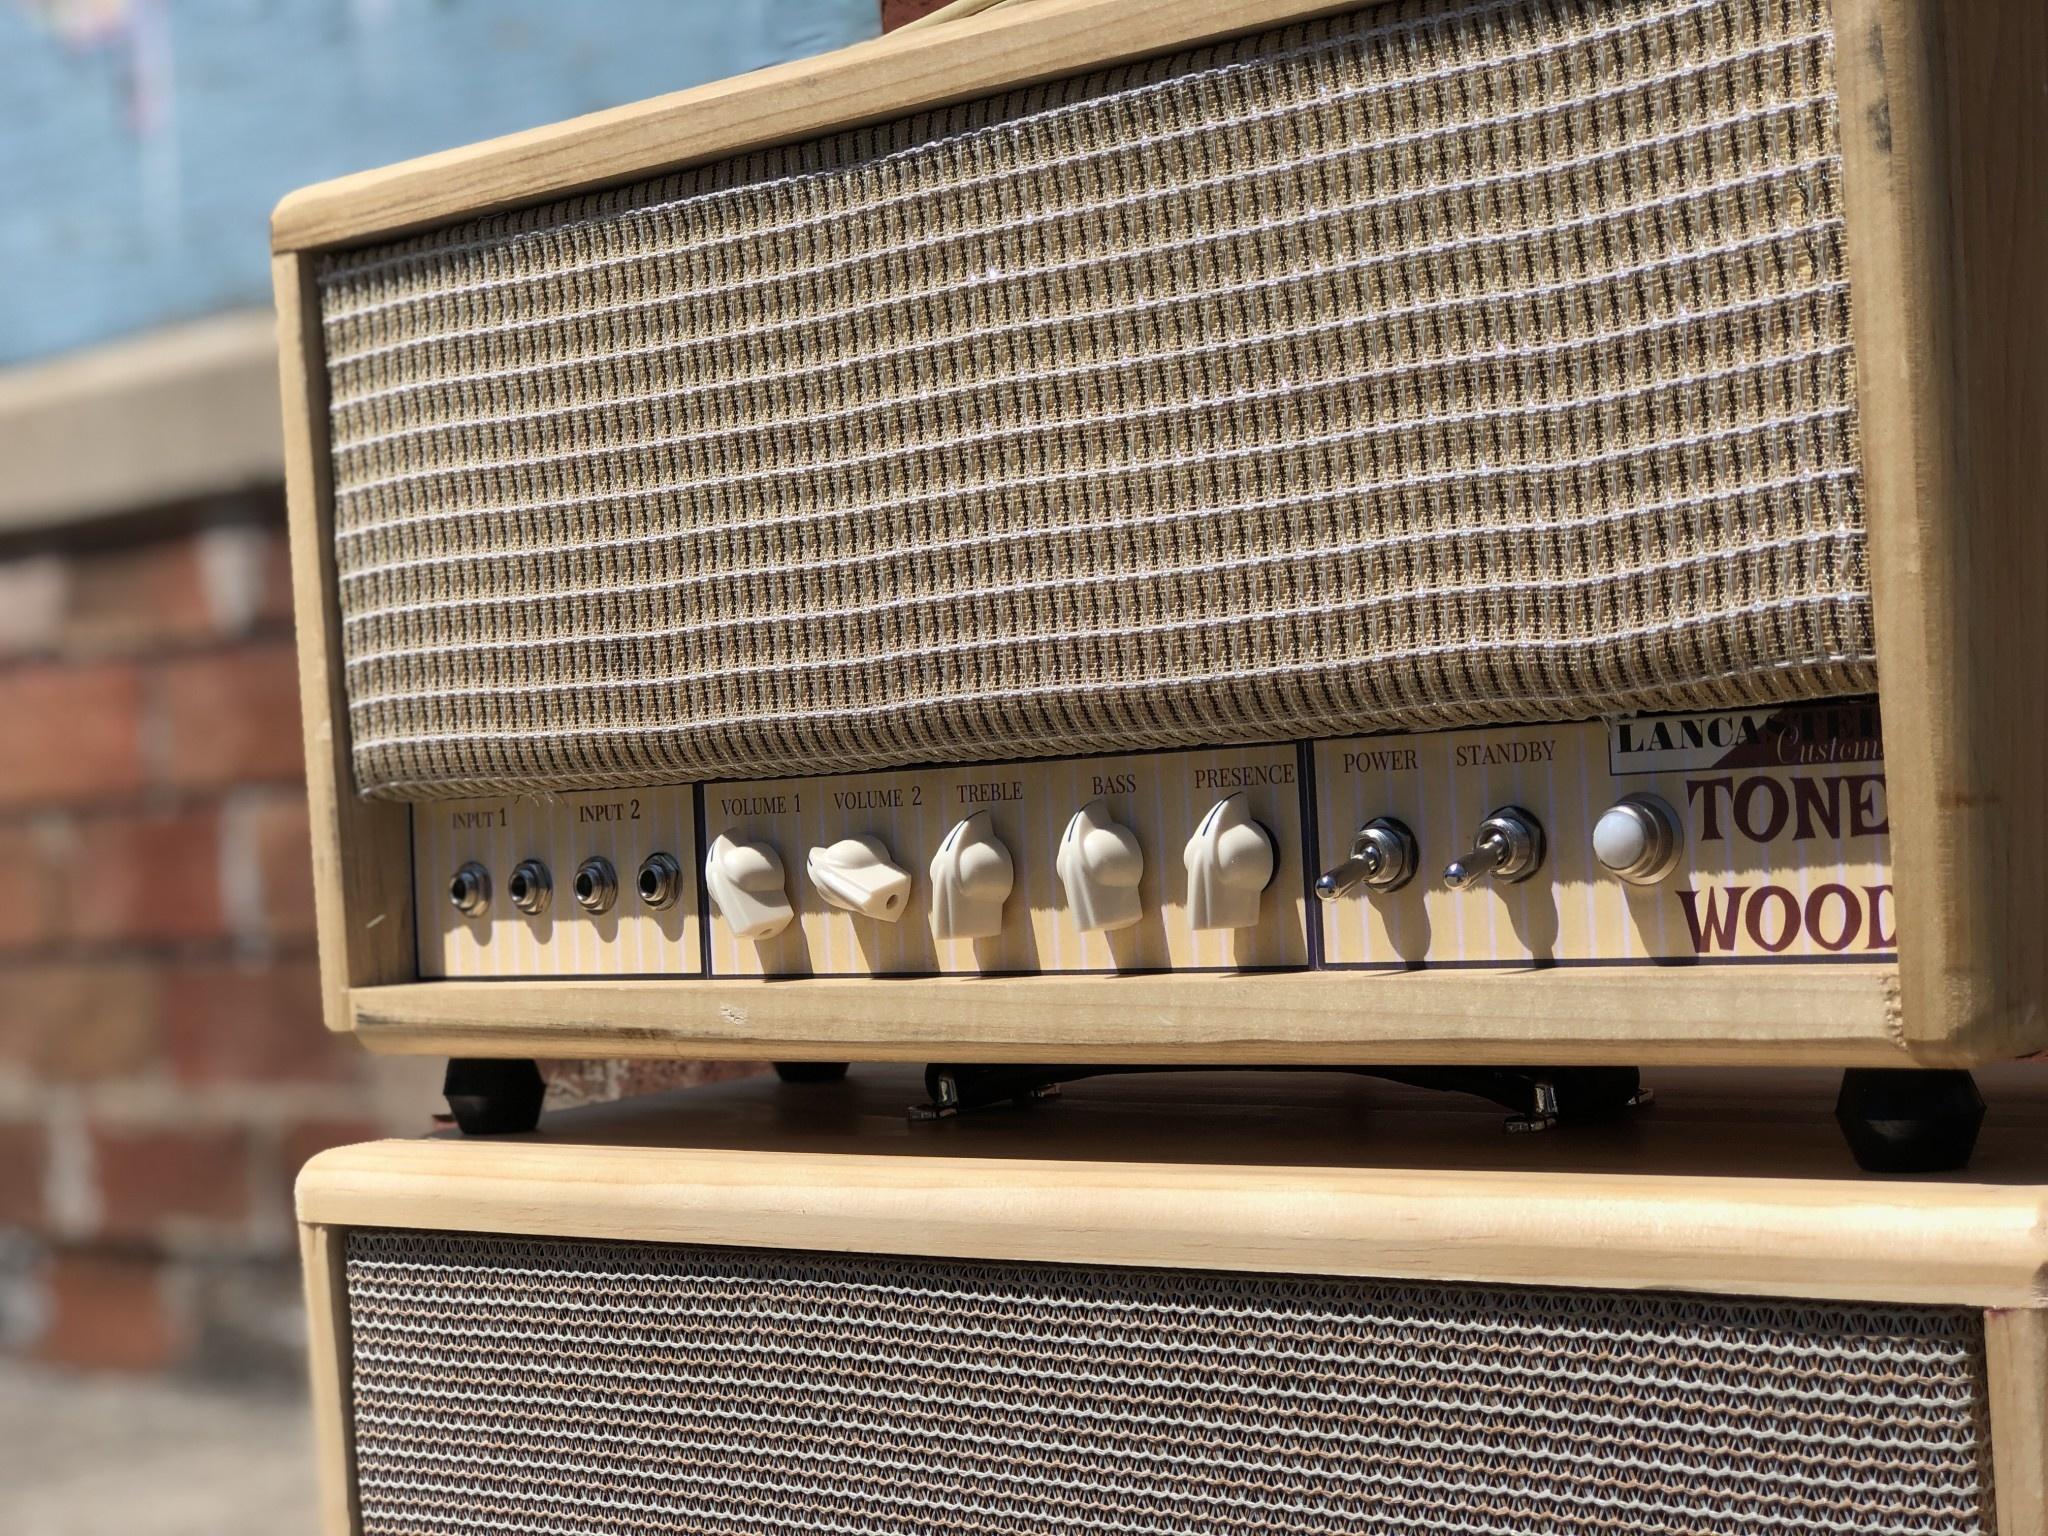 Lancaster Customs Tone Wood Head and 1x12 Cab-4